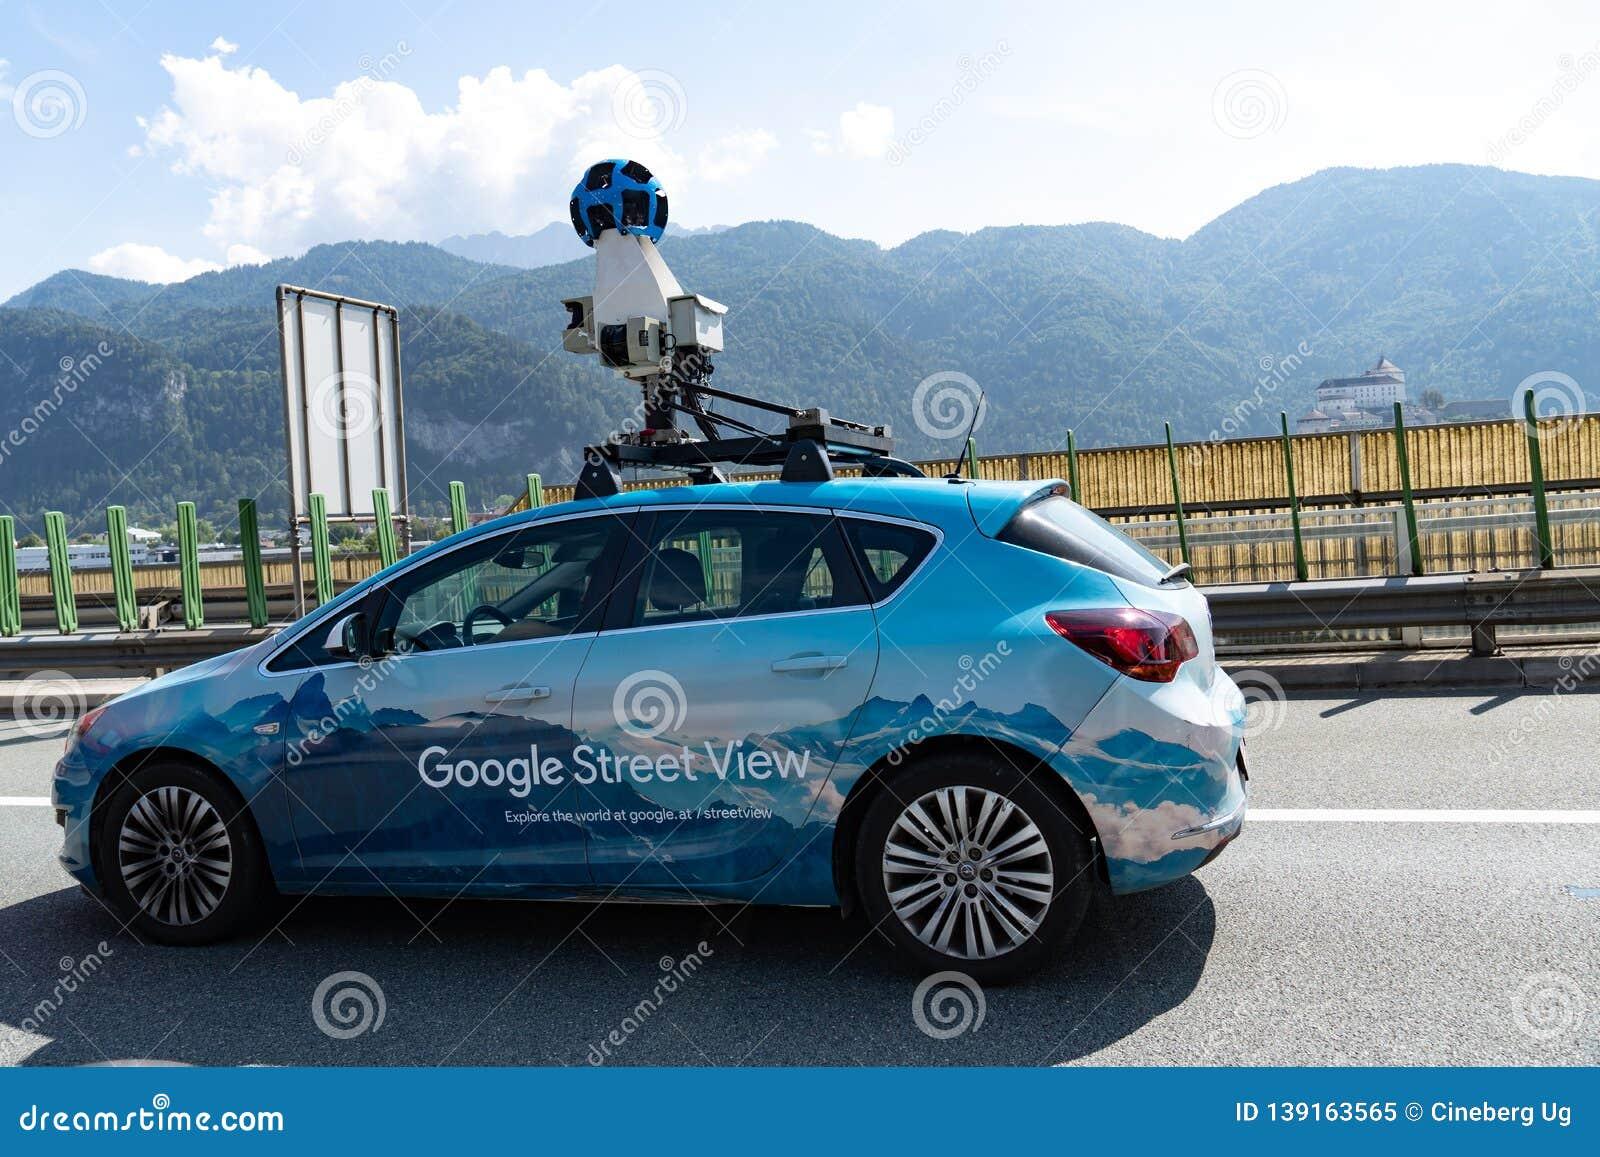 Google Street View Car editorial image  Image of google